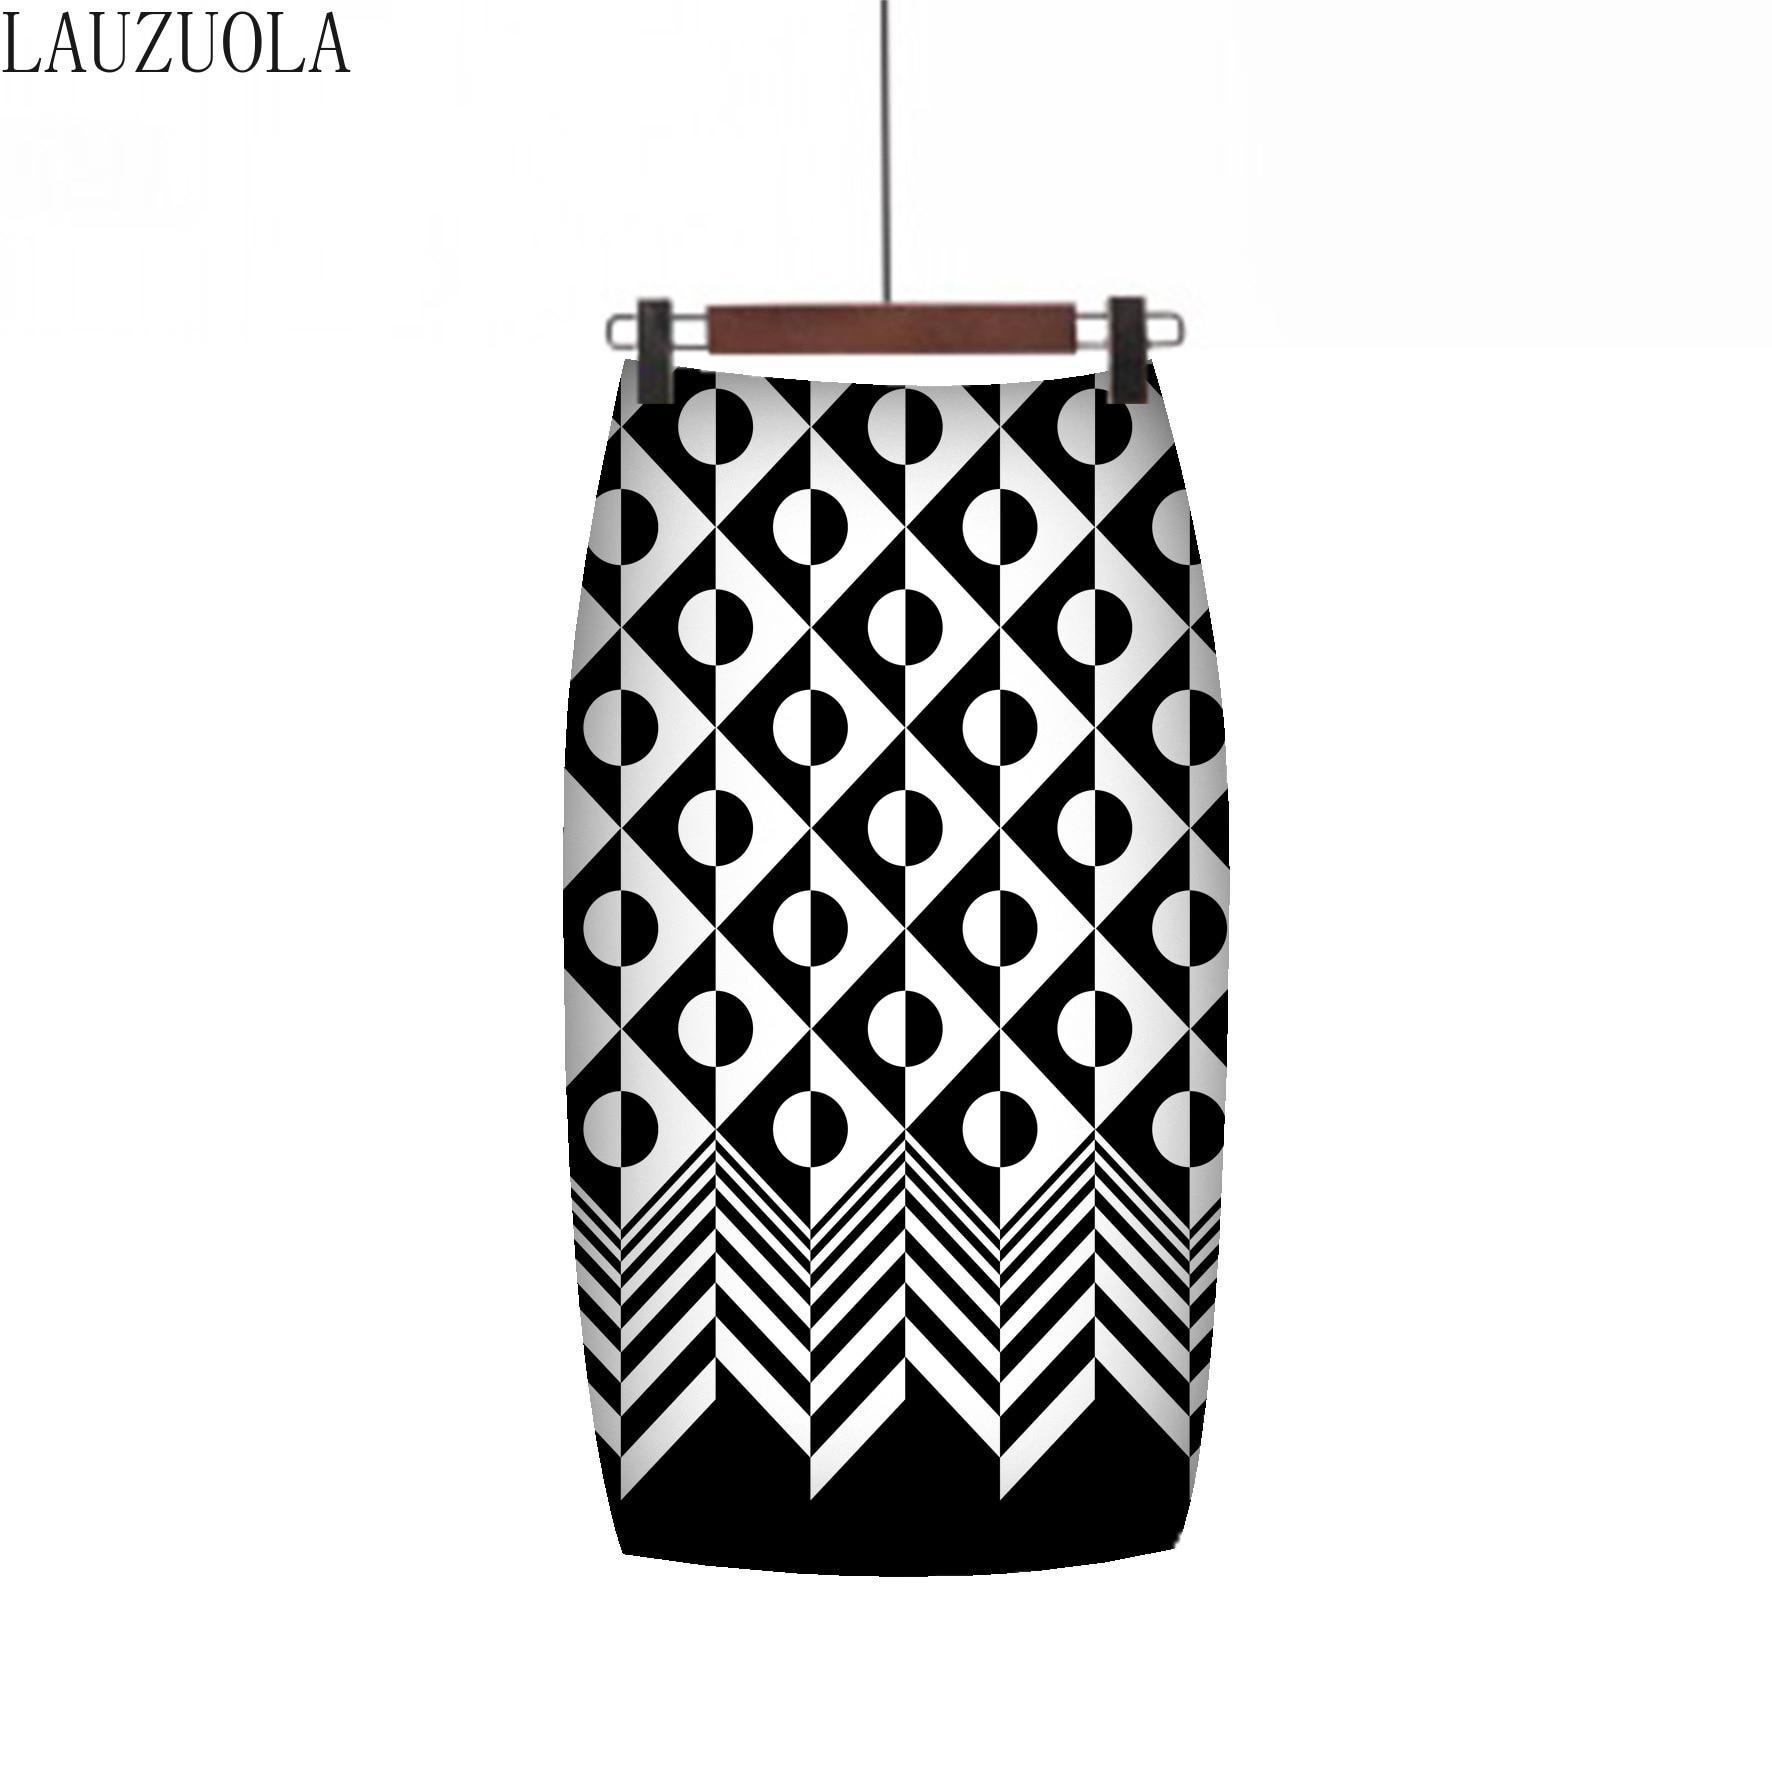 LAUZUOLA 2020 Fashion Women Summer Pencil Skirts High Waisted Floral Print Ladies Bodycon Skirt Knee-Length Saias Girls Faldas